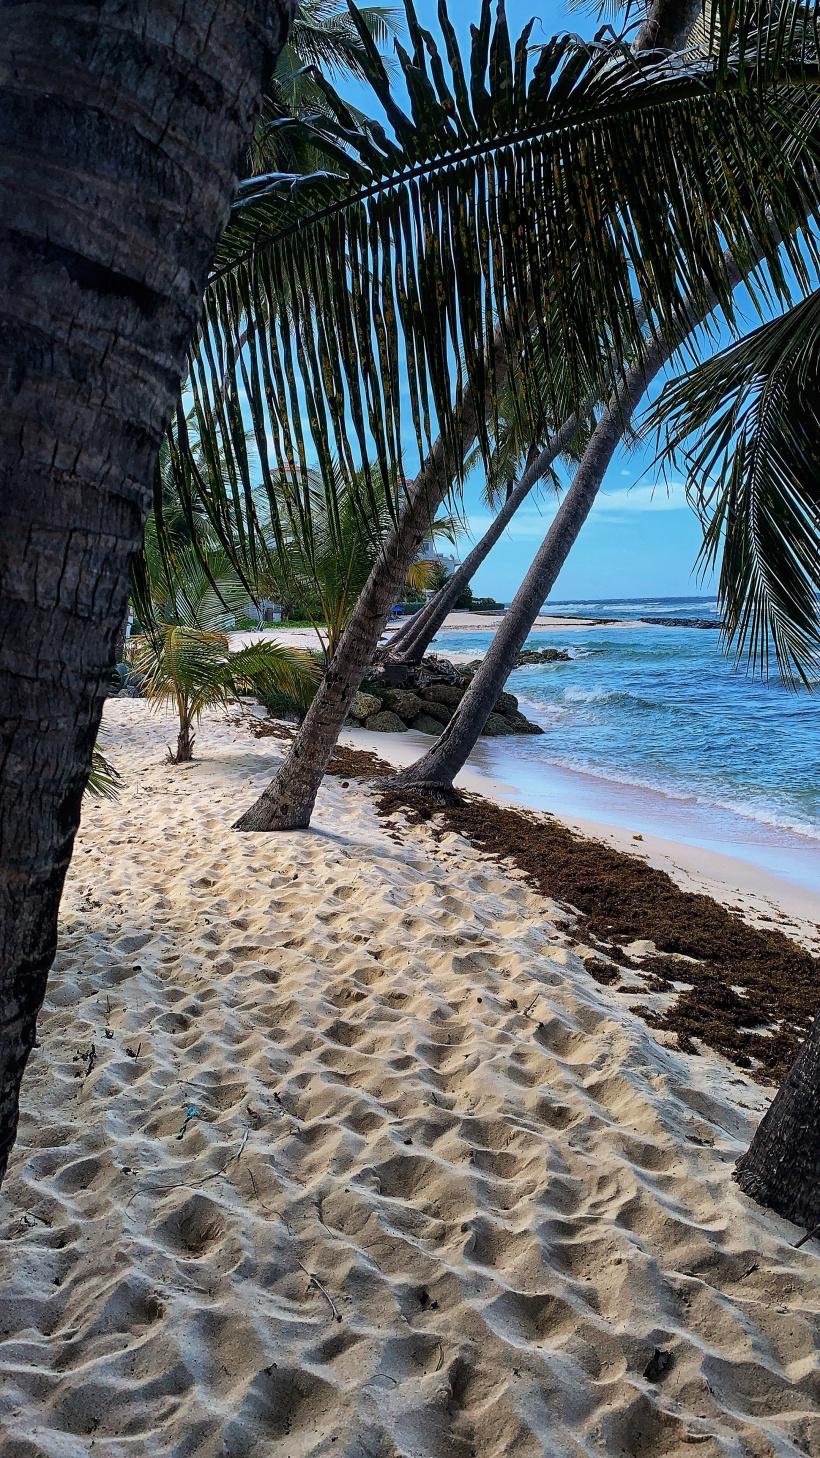 Traumhaftes Büro oder? Barbados lockt mit Karibik-Flair